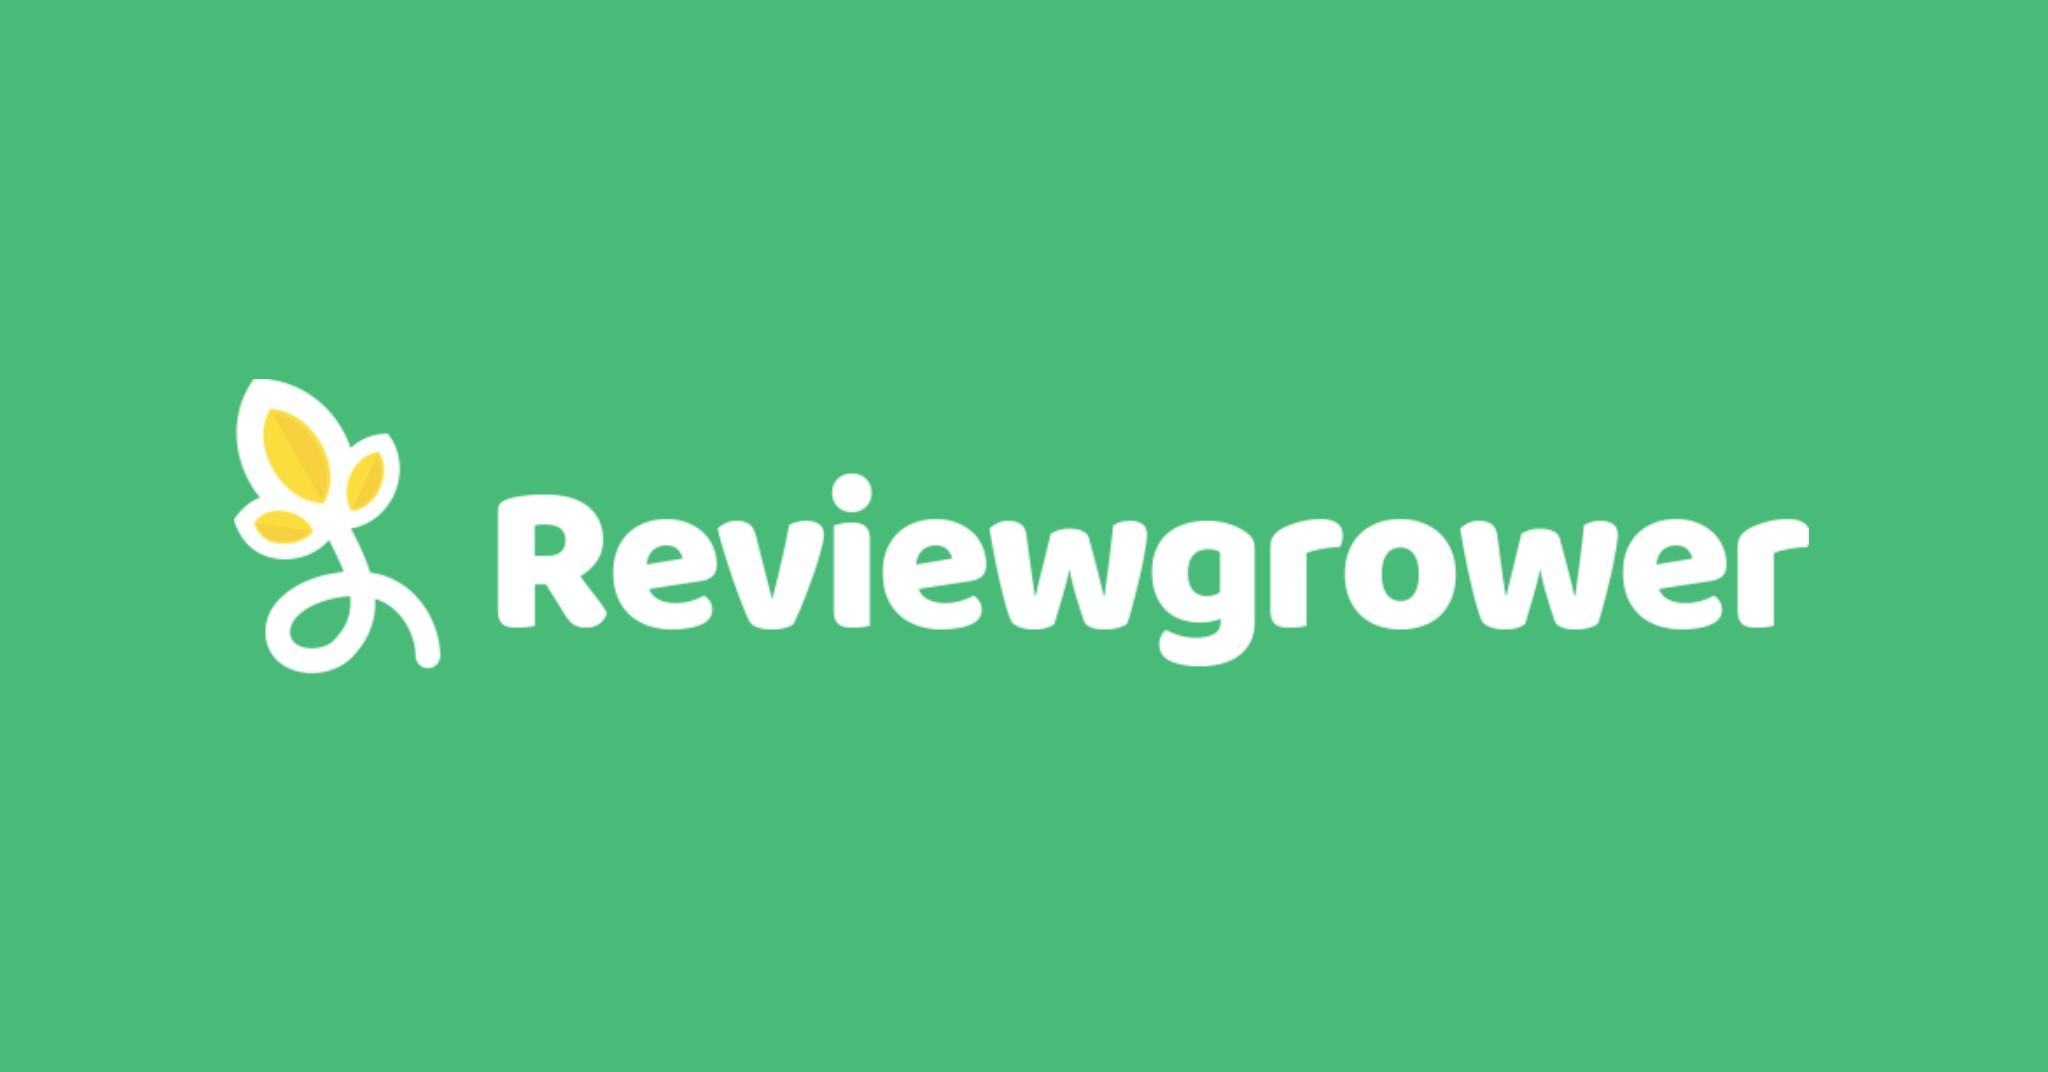 Reviewgrower